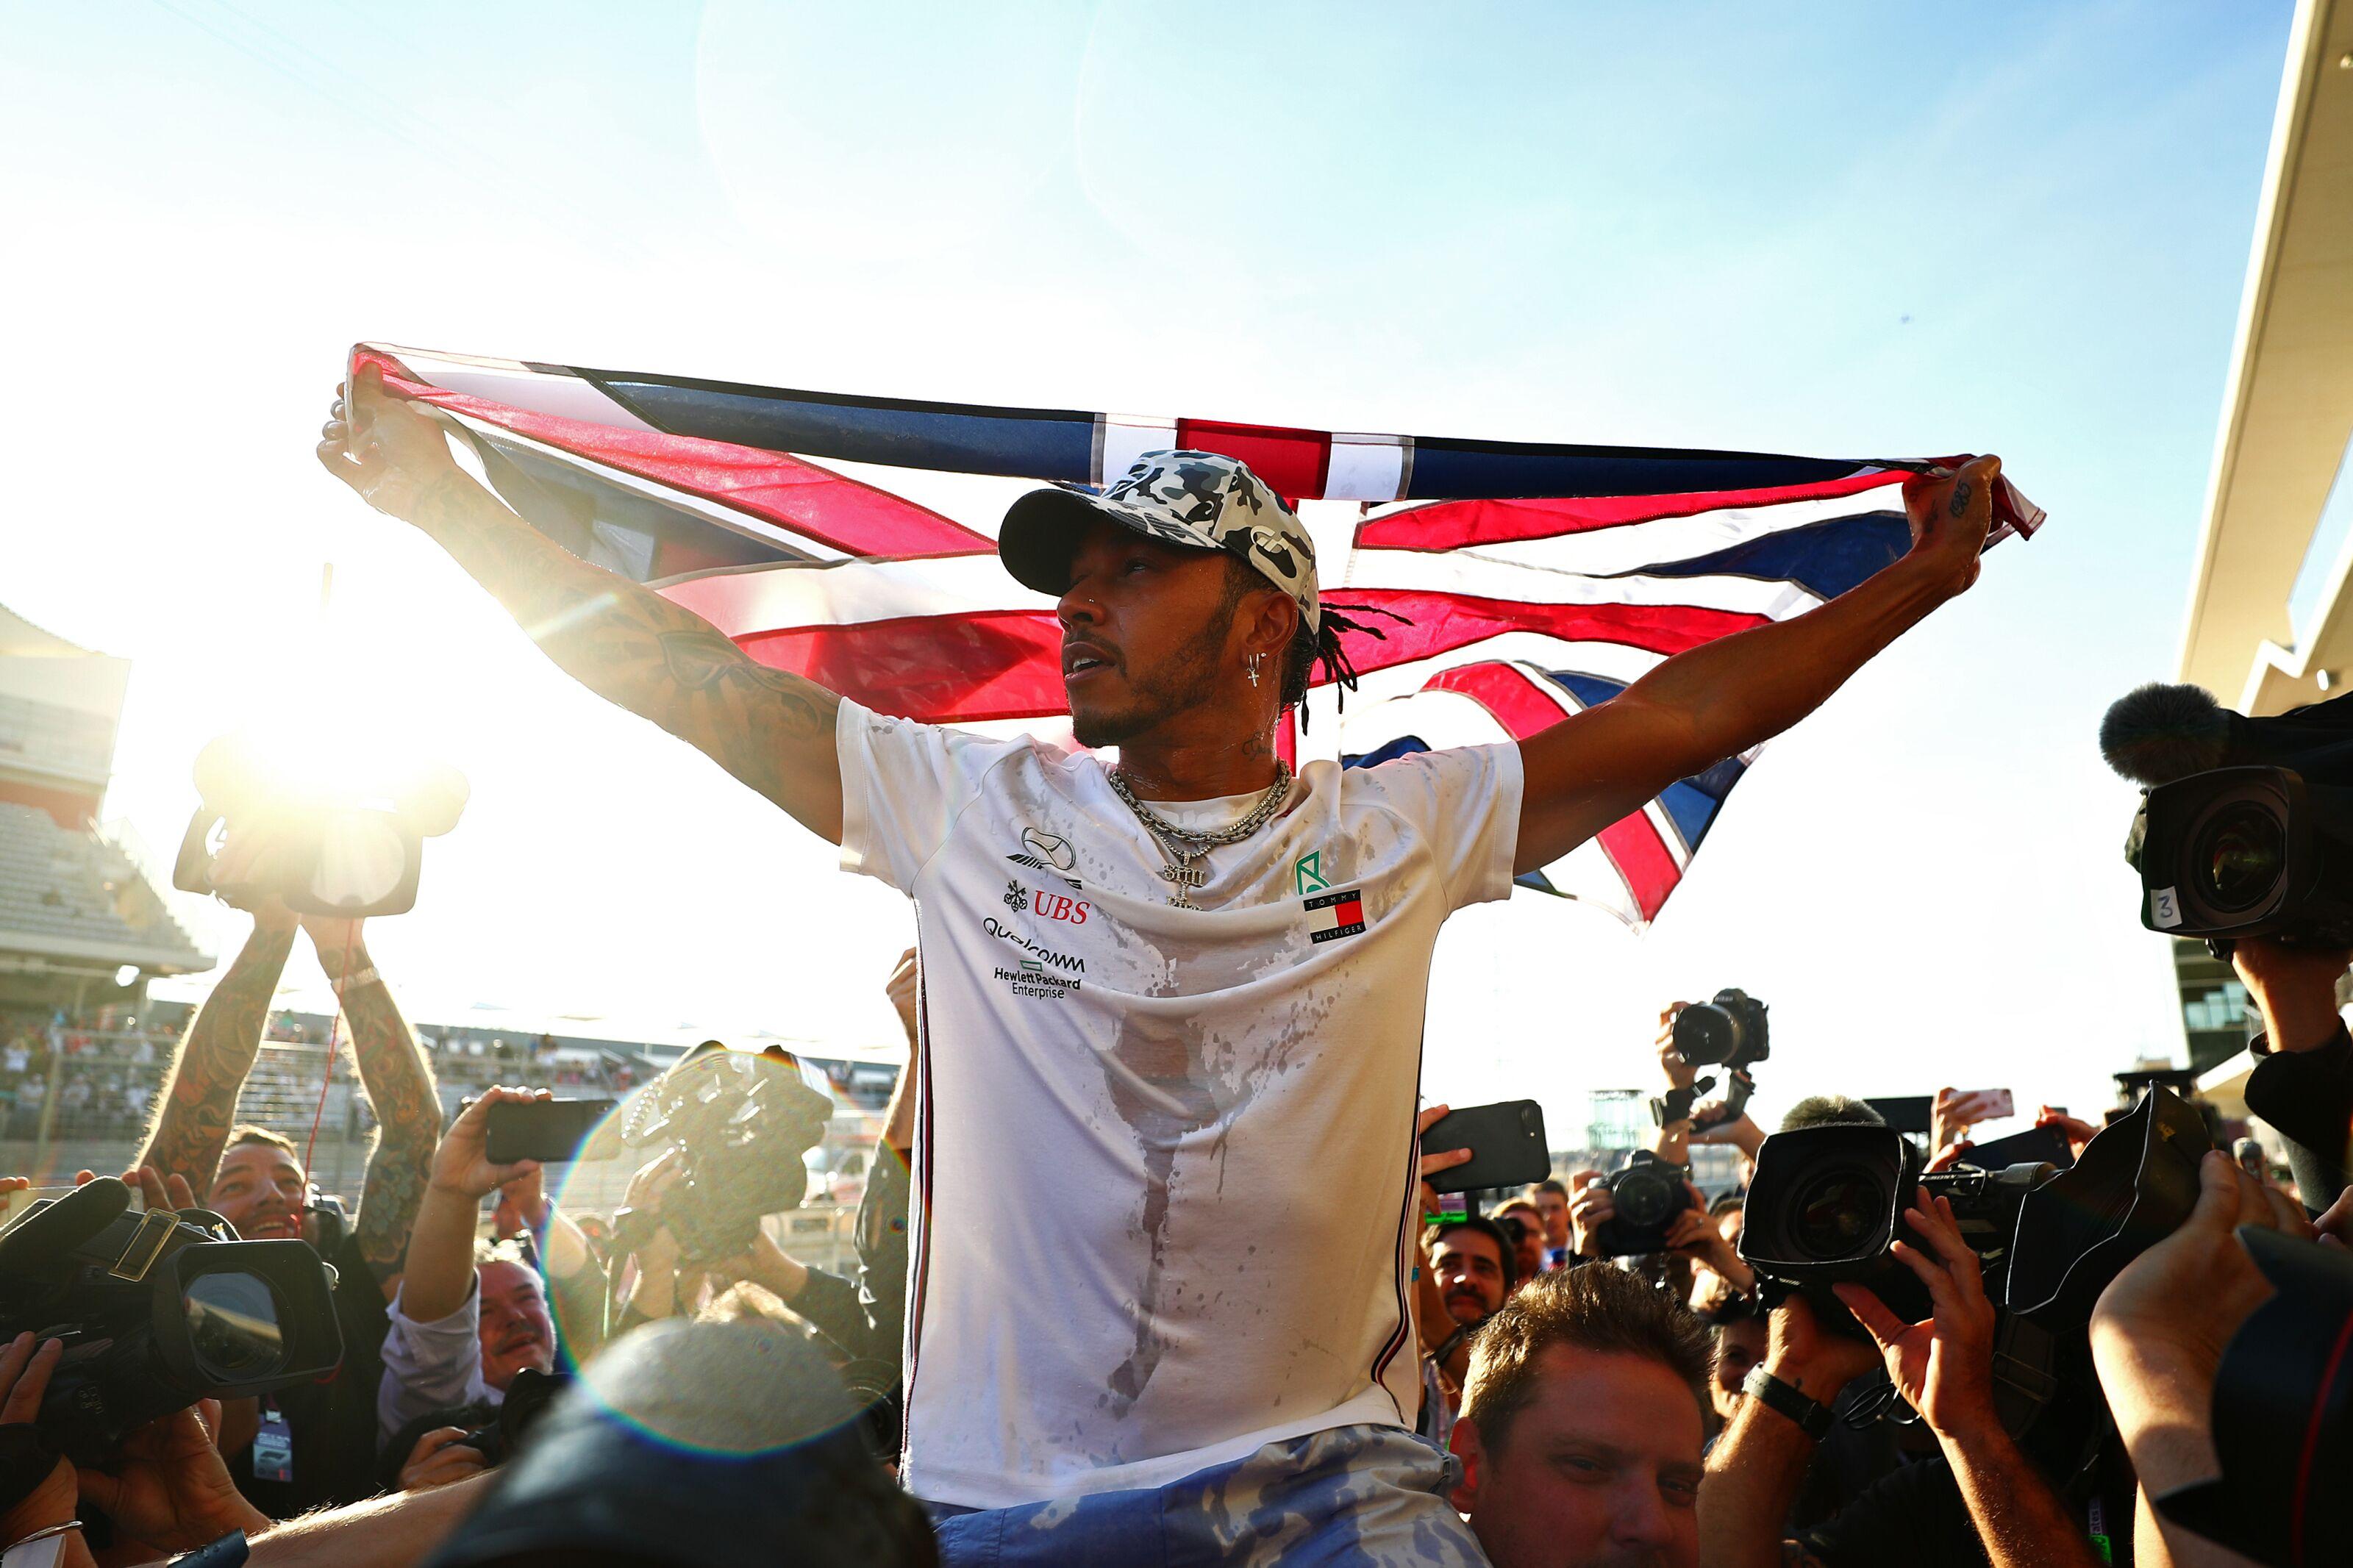 Formula 1: Lewis Hamilton's 2019 season is far from over